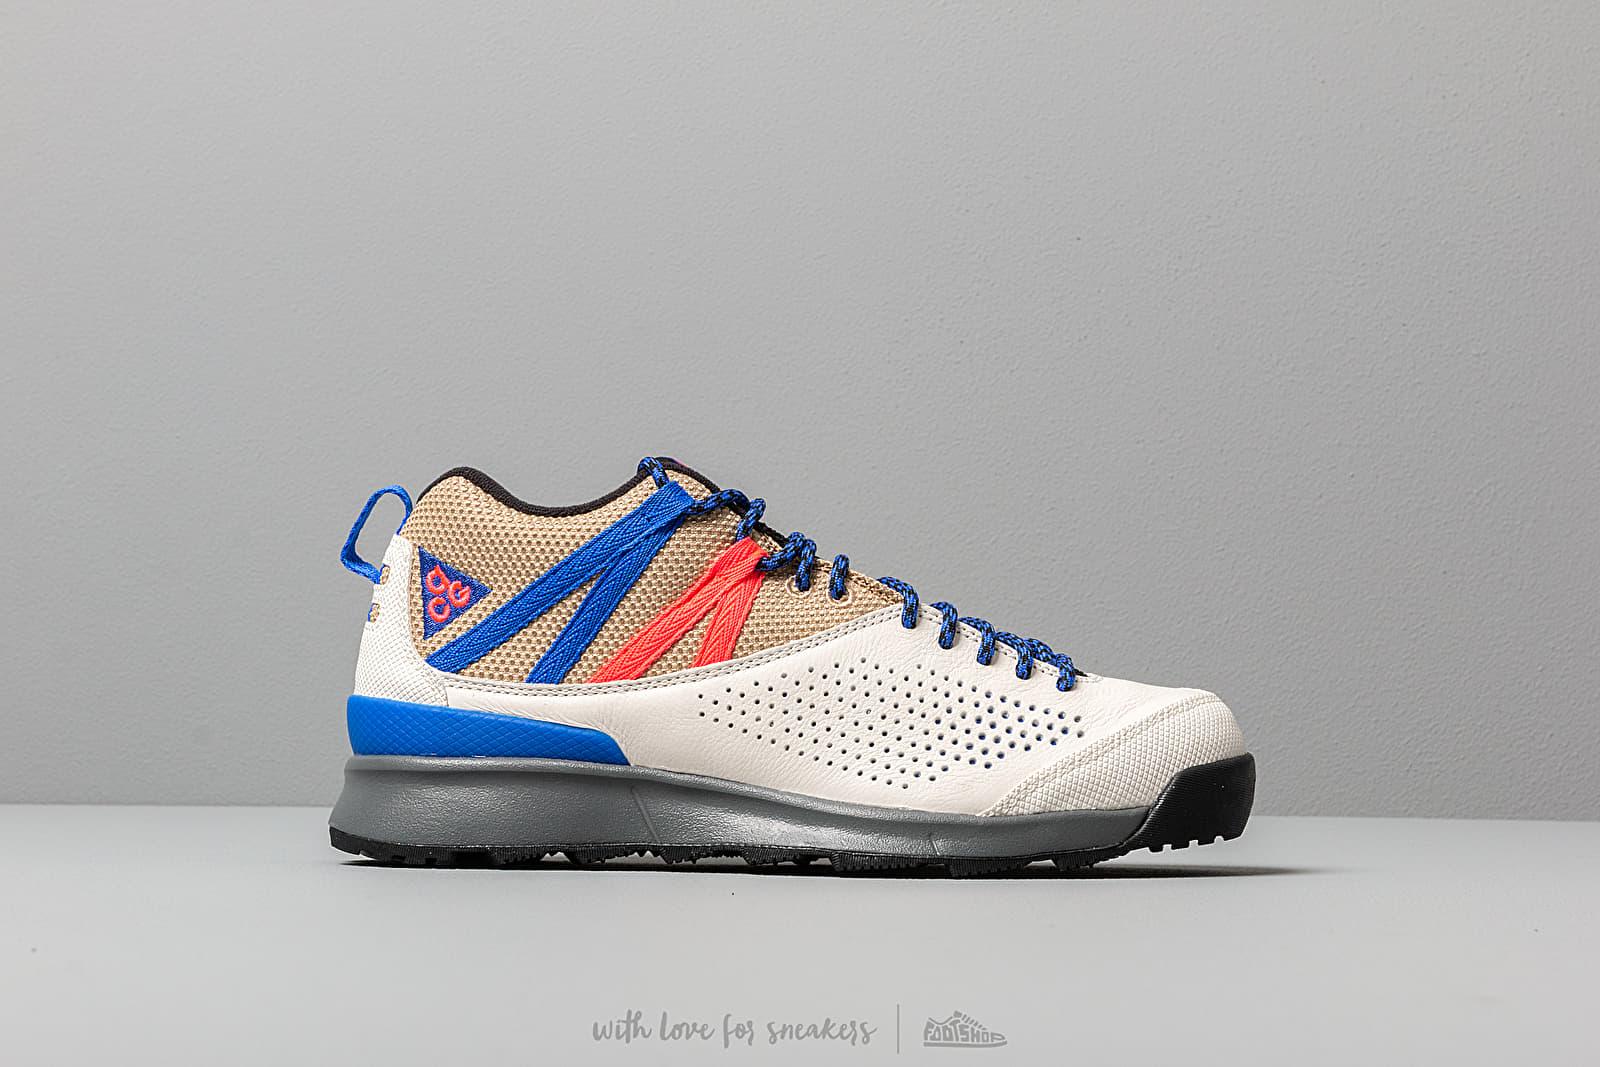 separation shoes c91e4 02cdc Nike Okwahn II Sail  Racer Blue-Racer Pink-Desert a muy buen precio